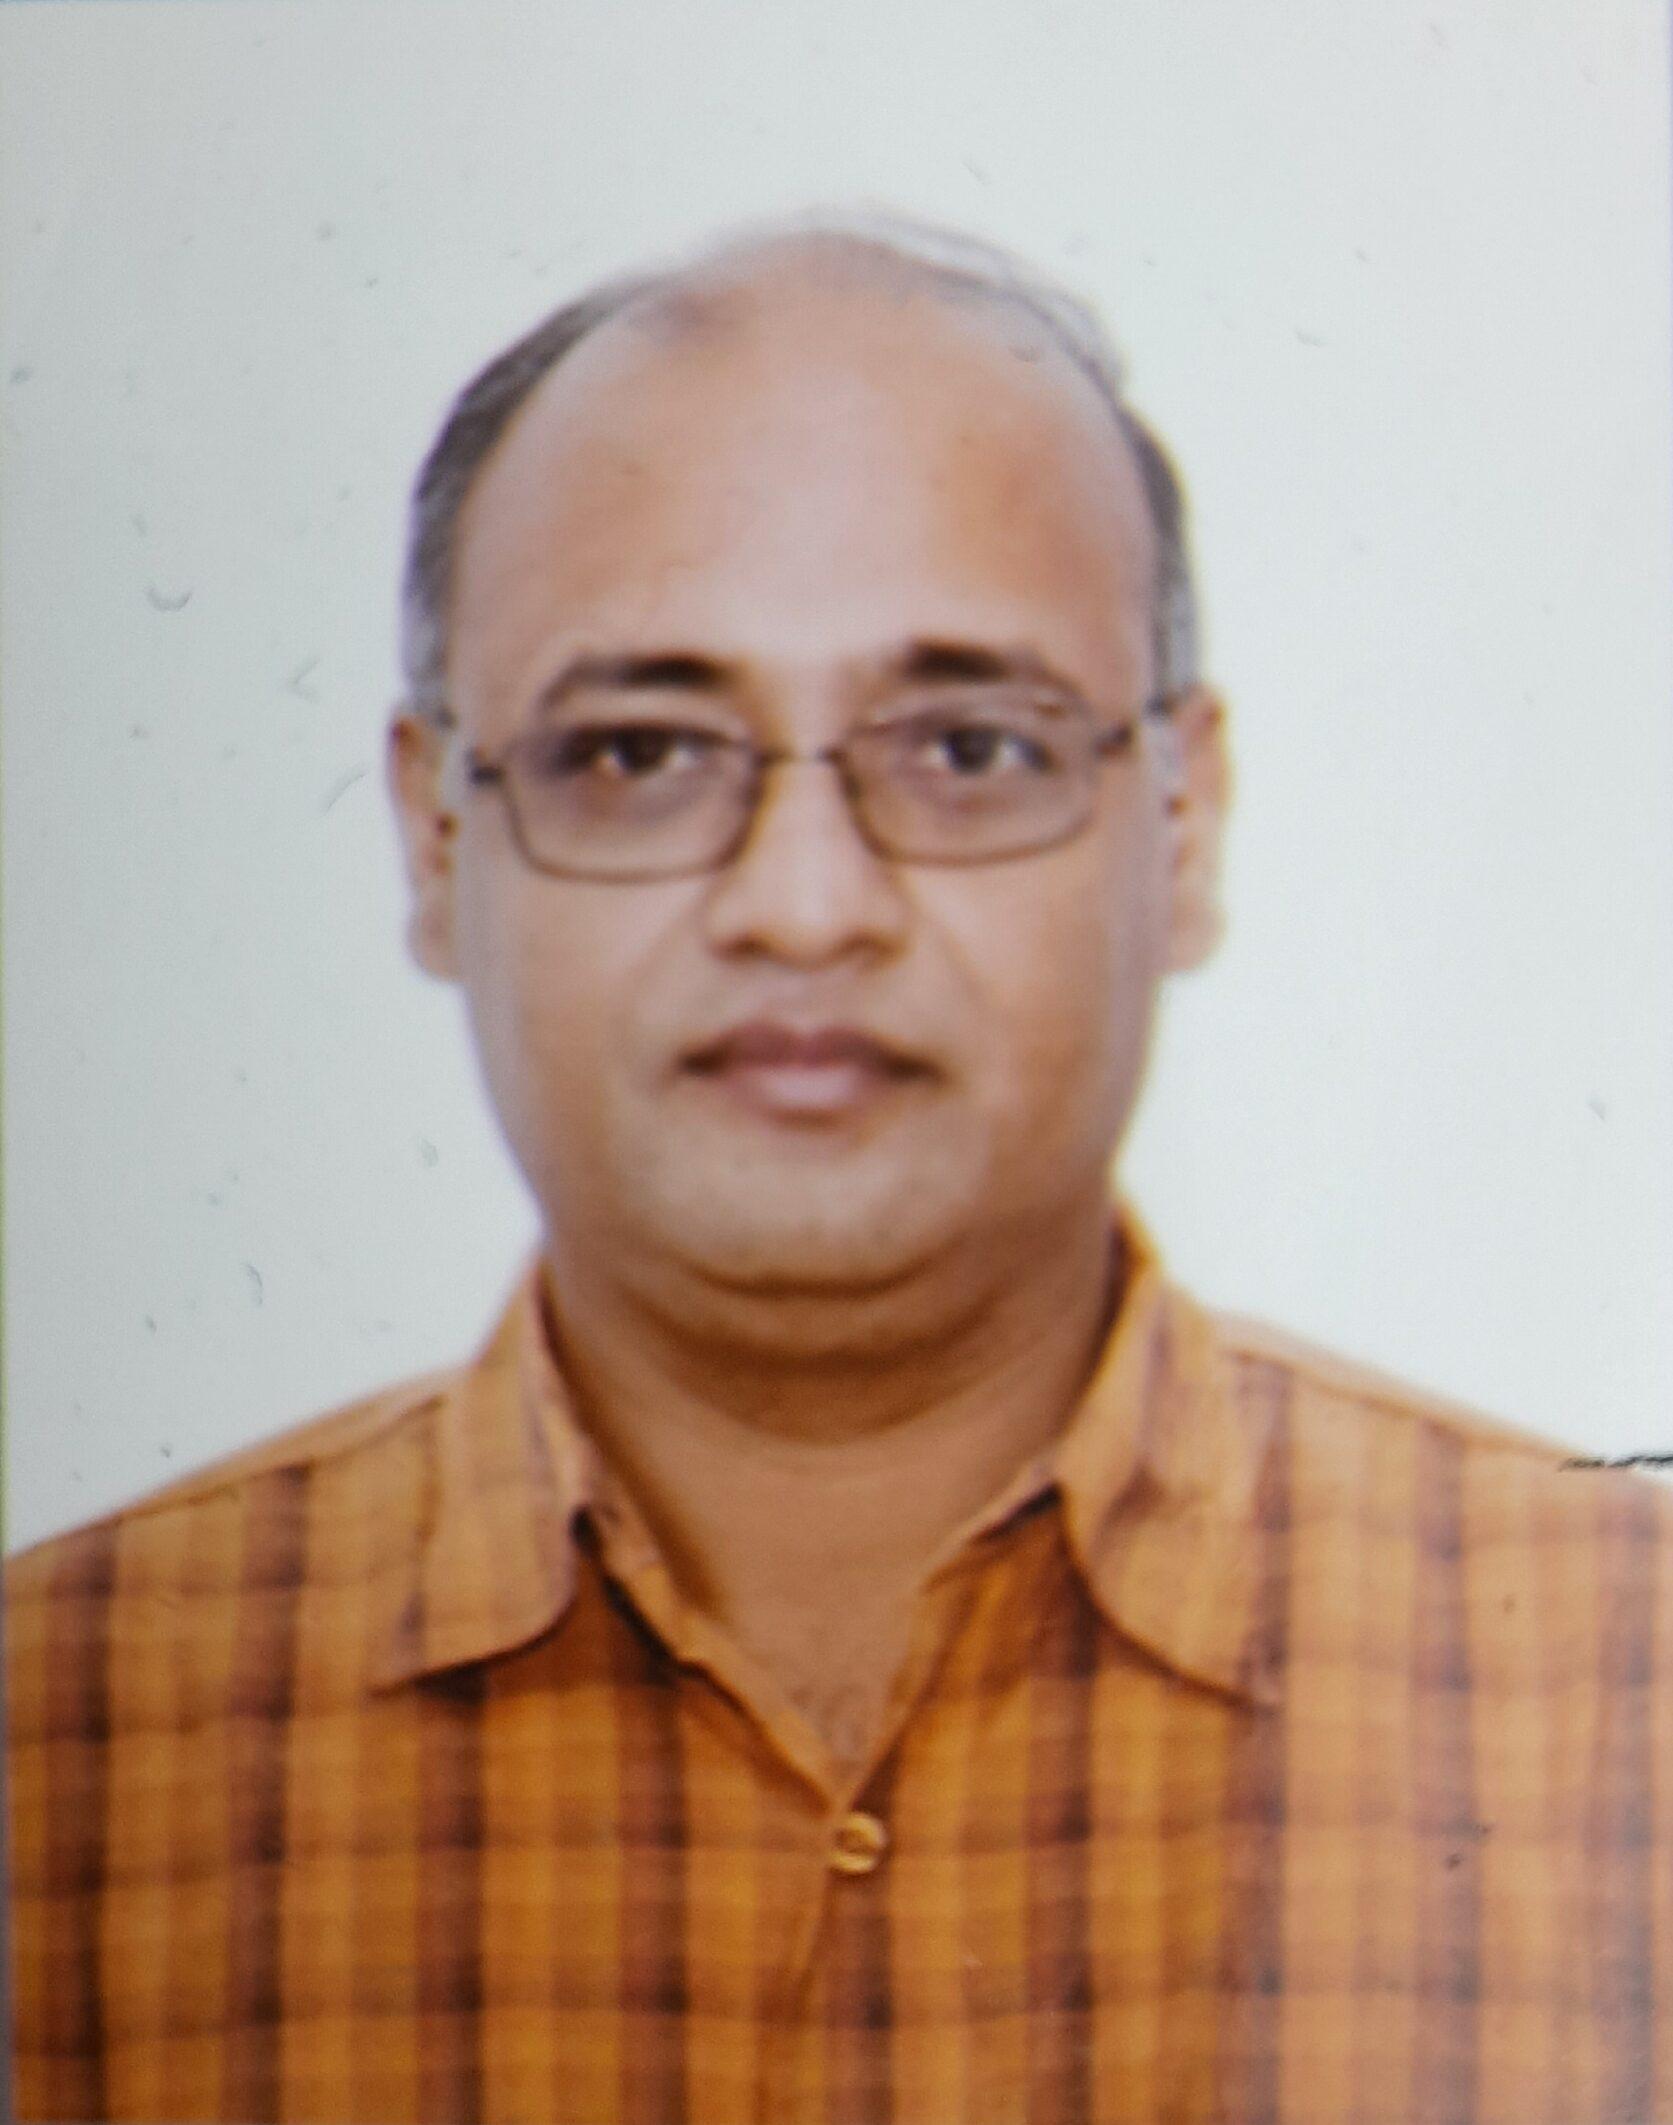 Anupam Anand